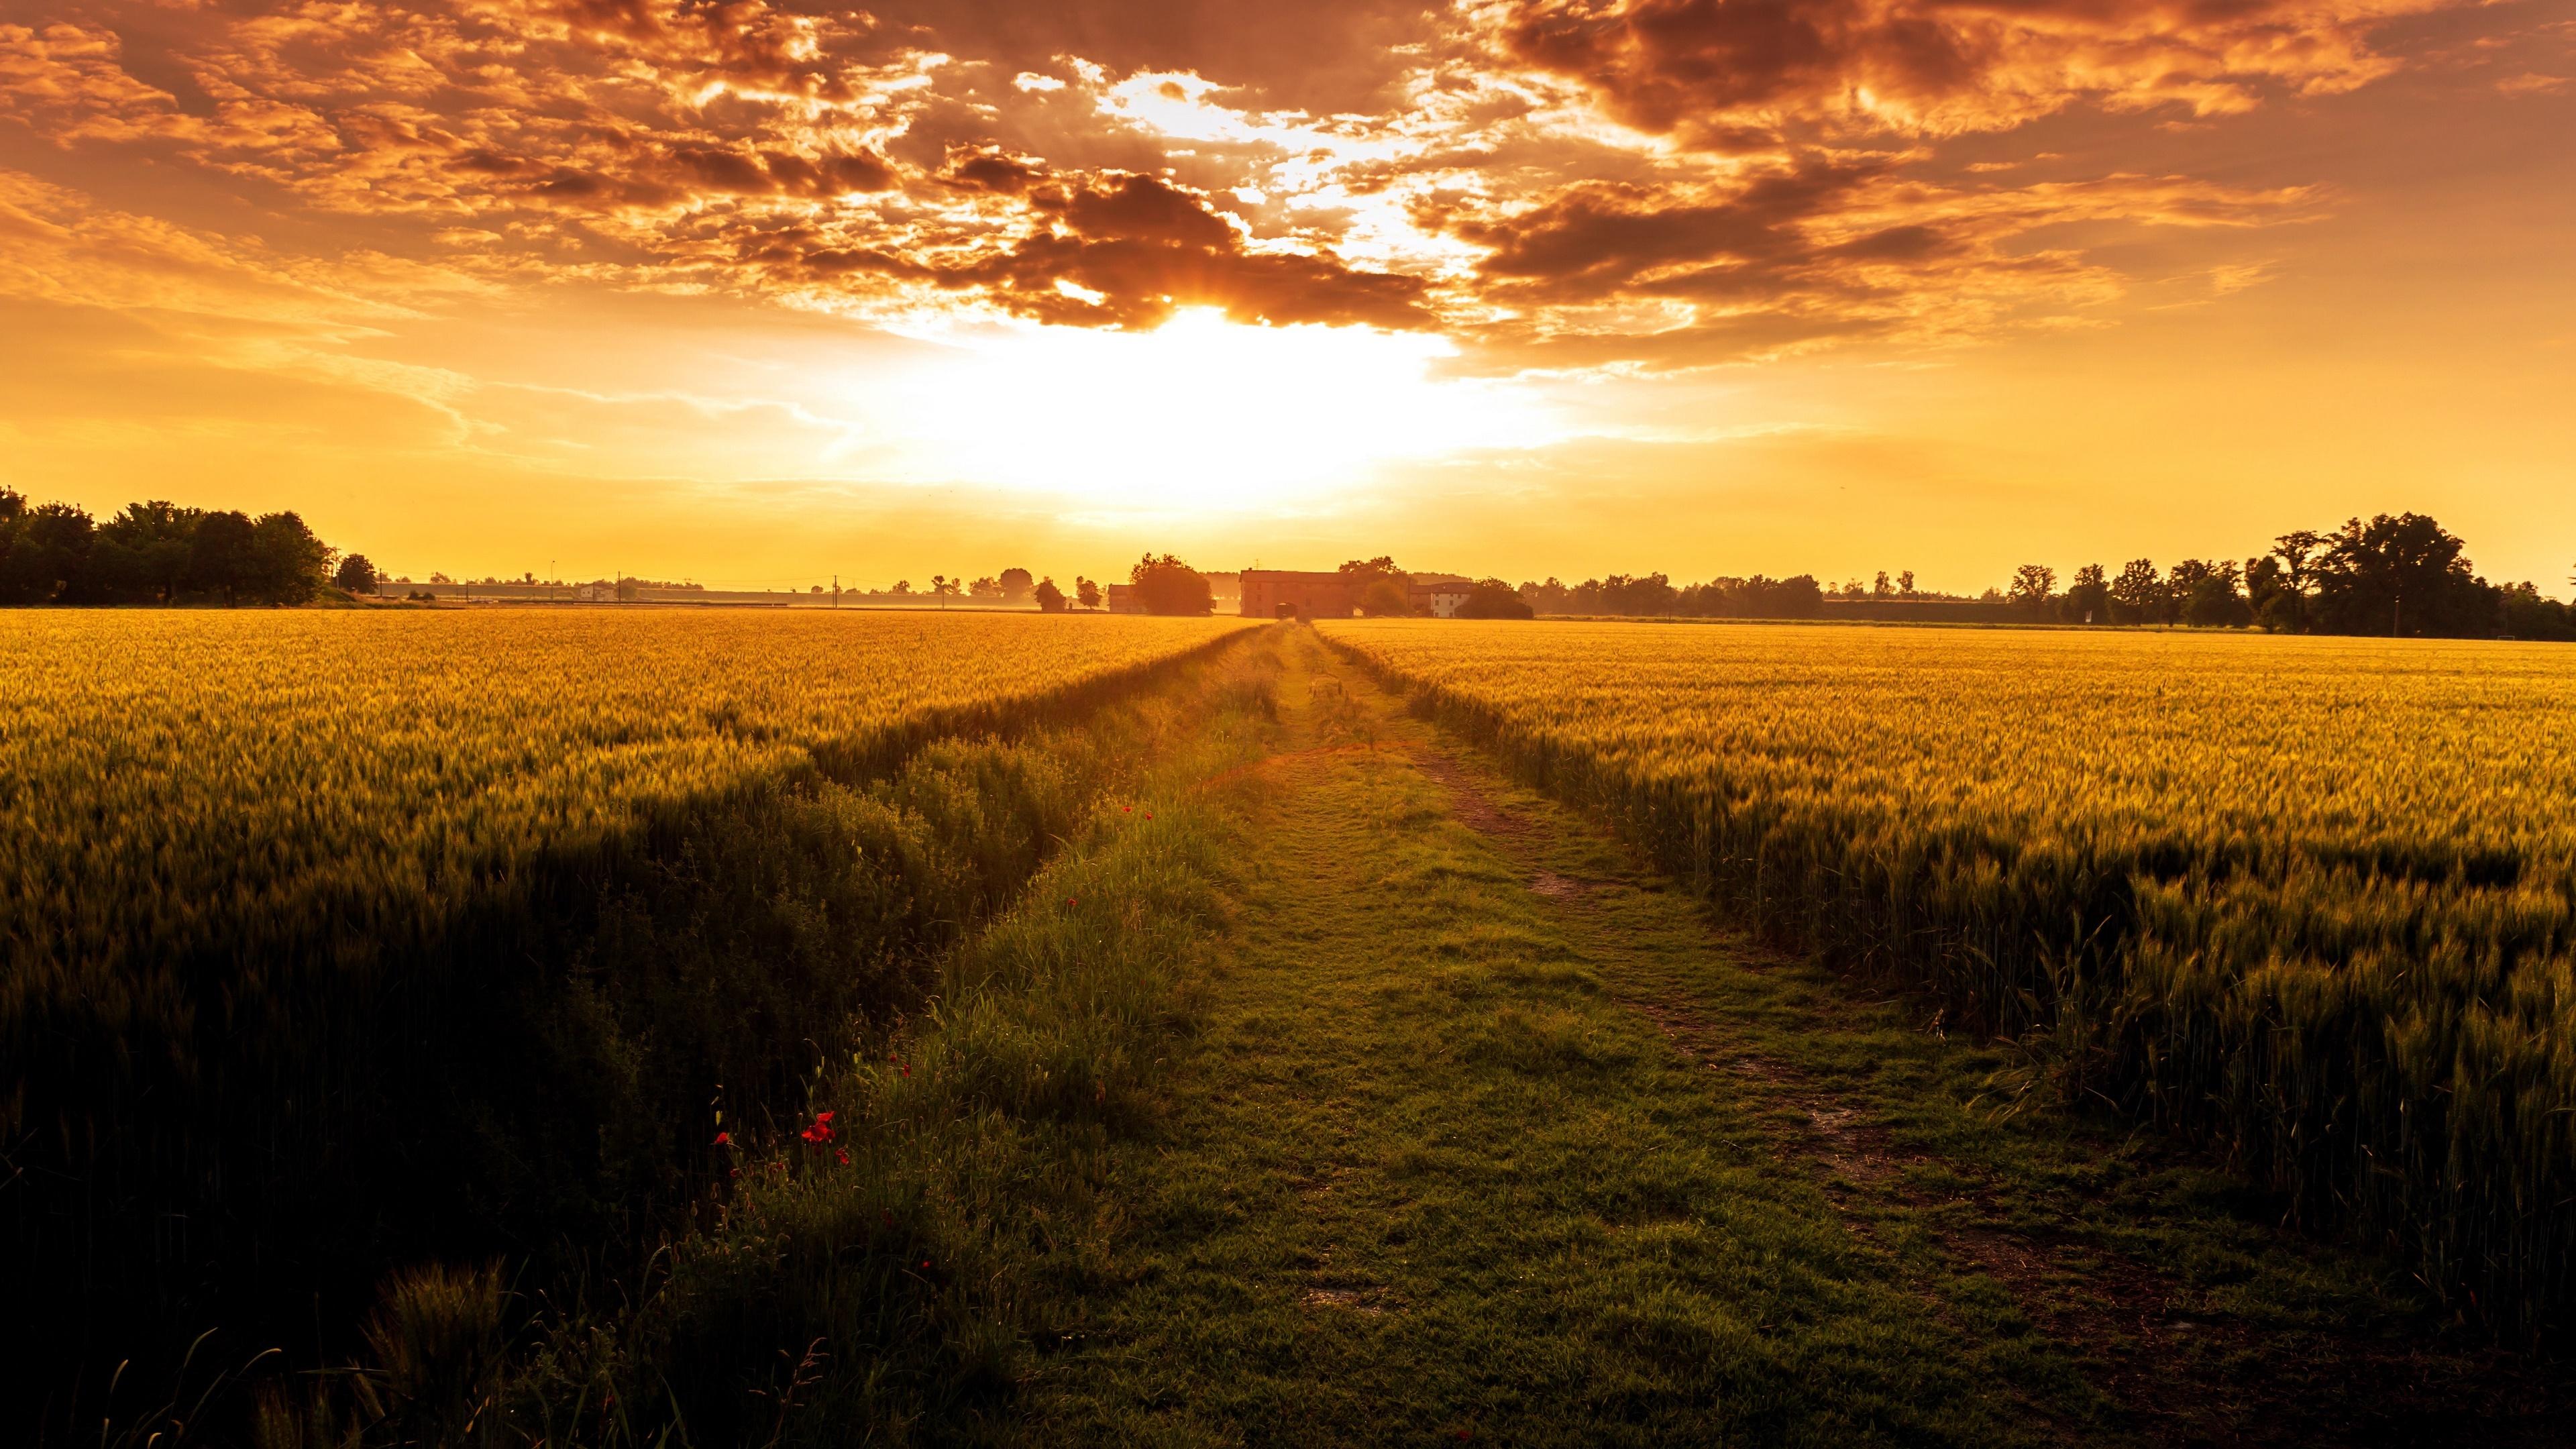 Sunset over the crop field wallpaper